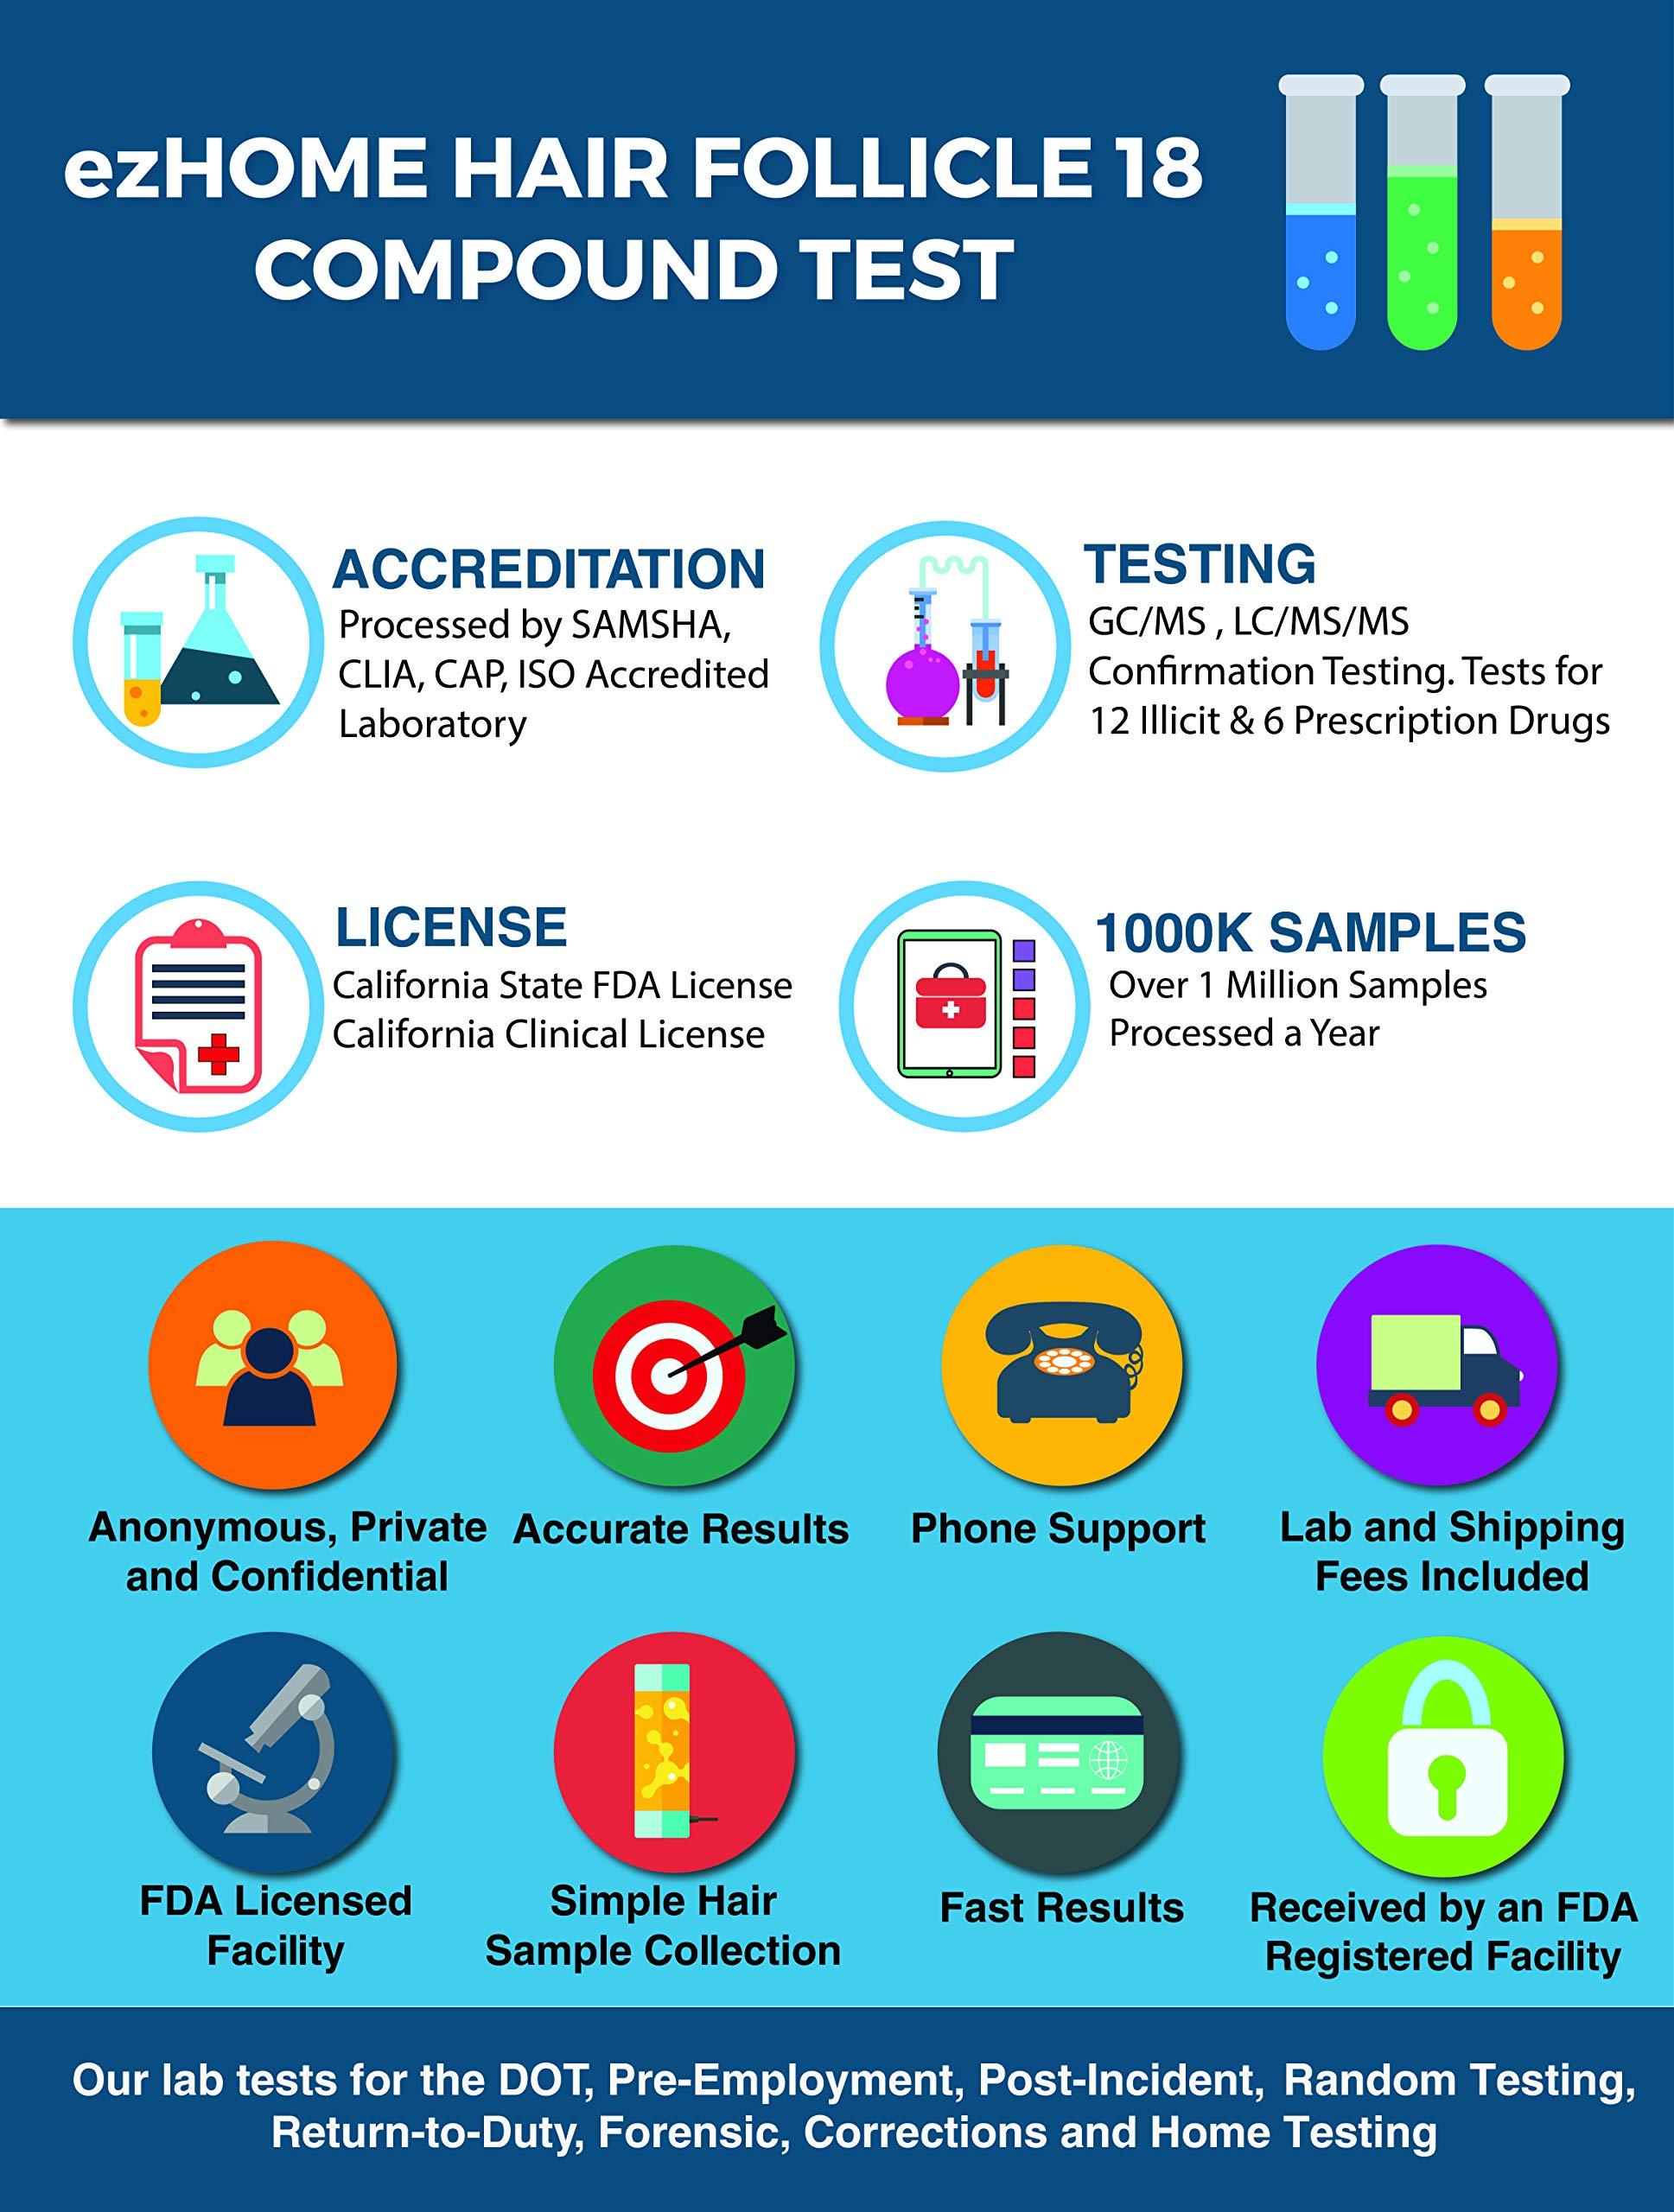 ezHOME Hair Follicle 18 Drug Compound Test